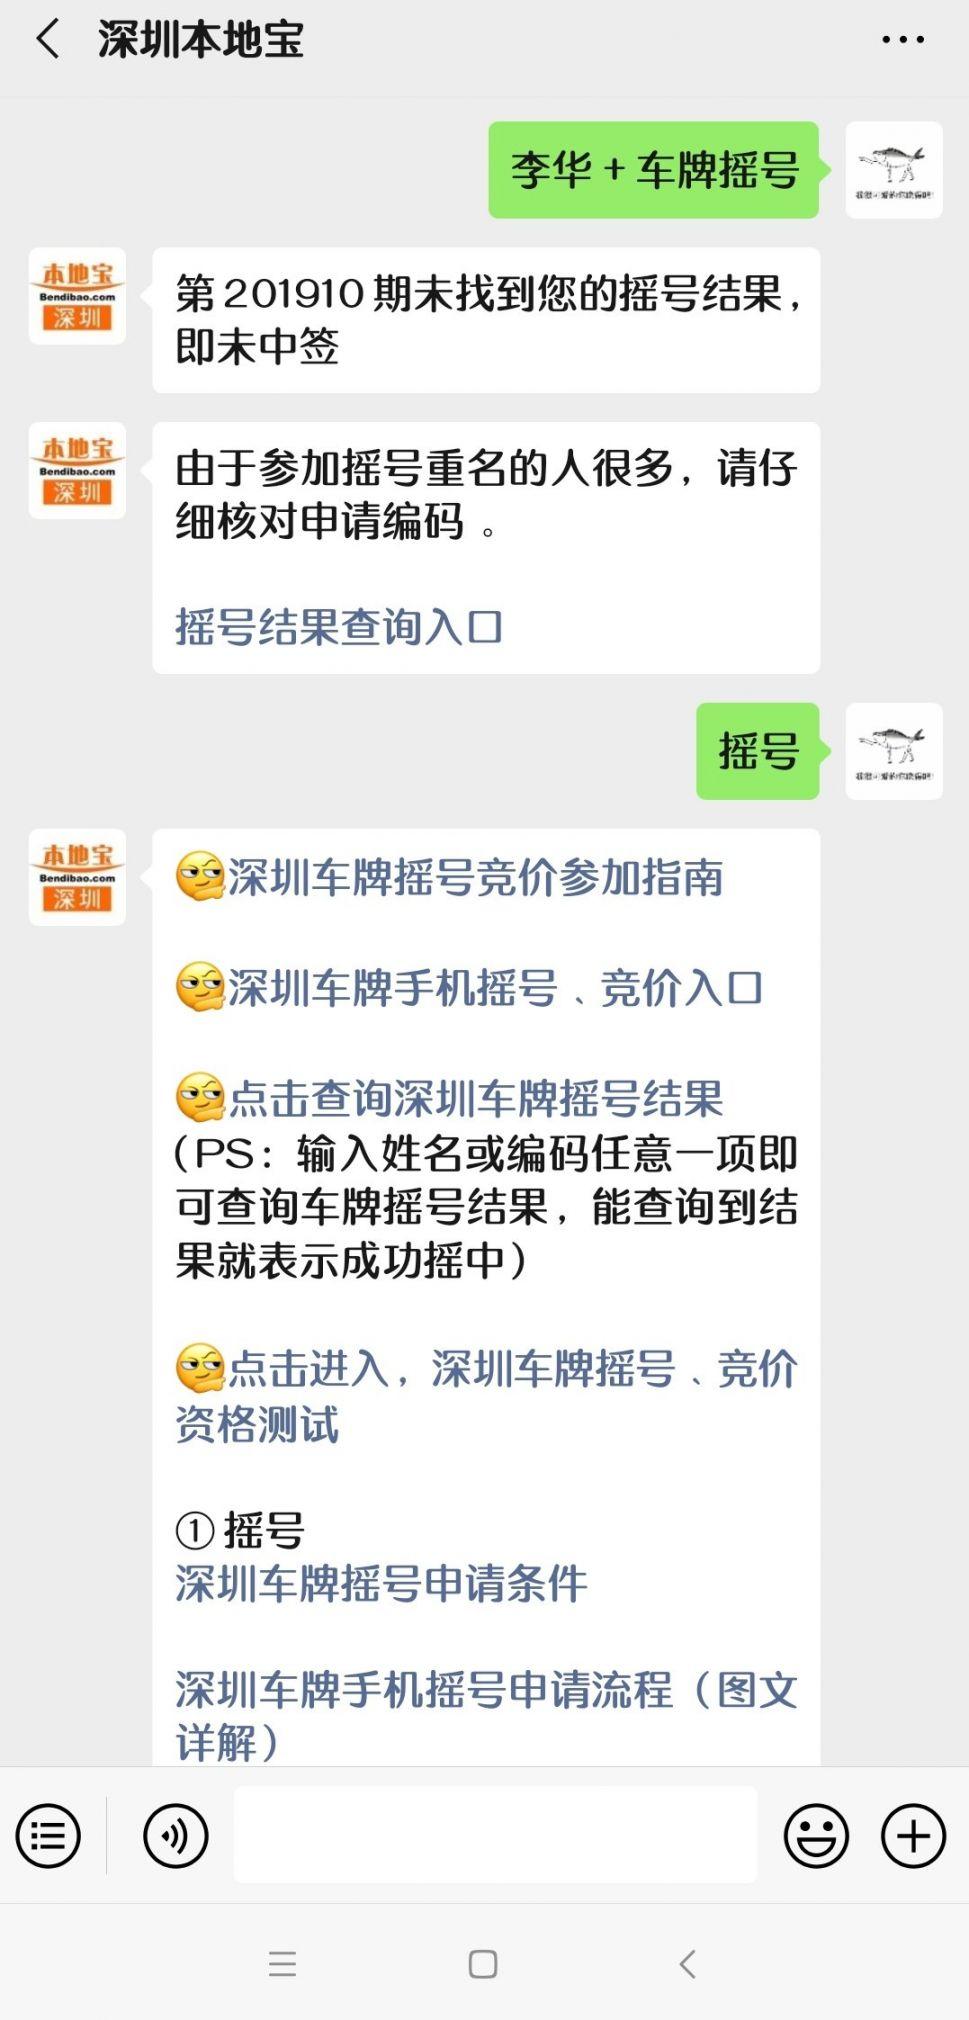 http://www.szminfu.com/shenzhenxinwen/43593.html